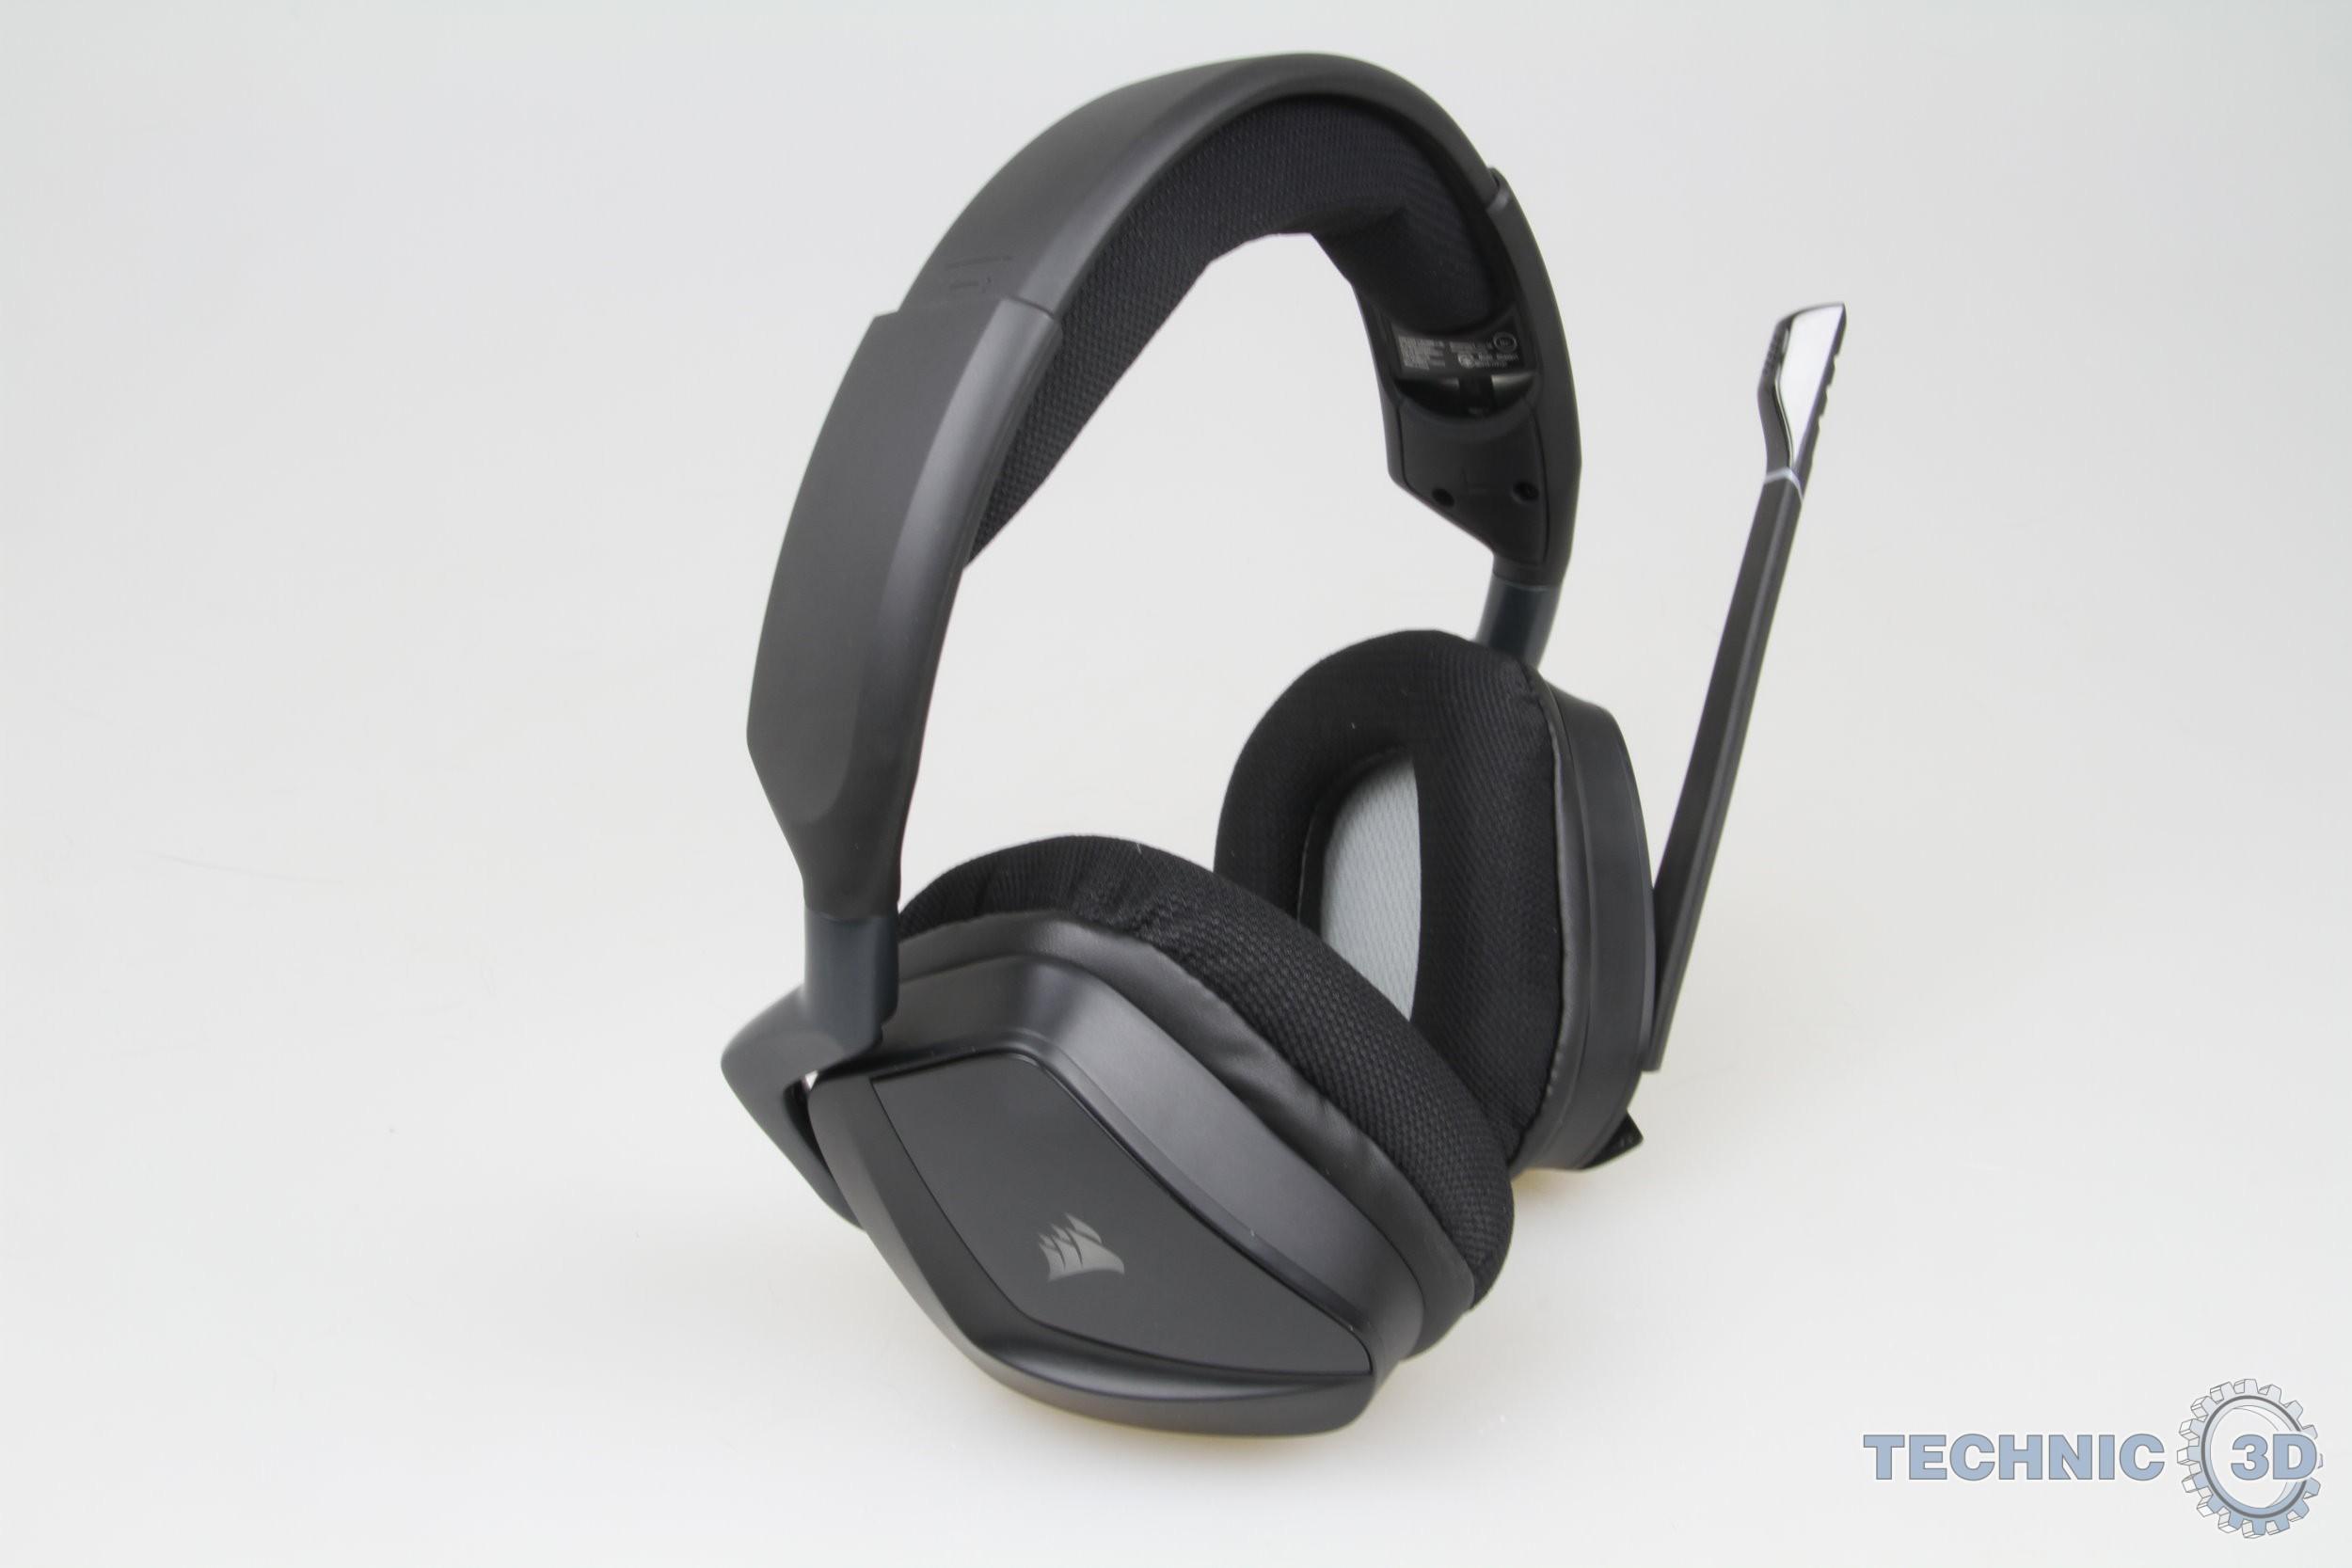 6ba4ac6fbe4 Corsair VOID PRO RGB Wireless Headset im Test | Review | Technic3D